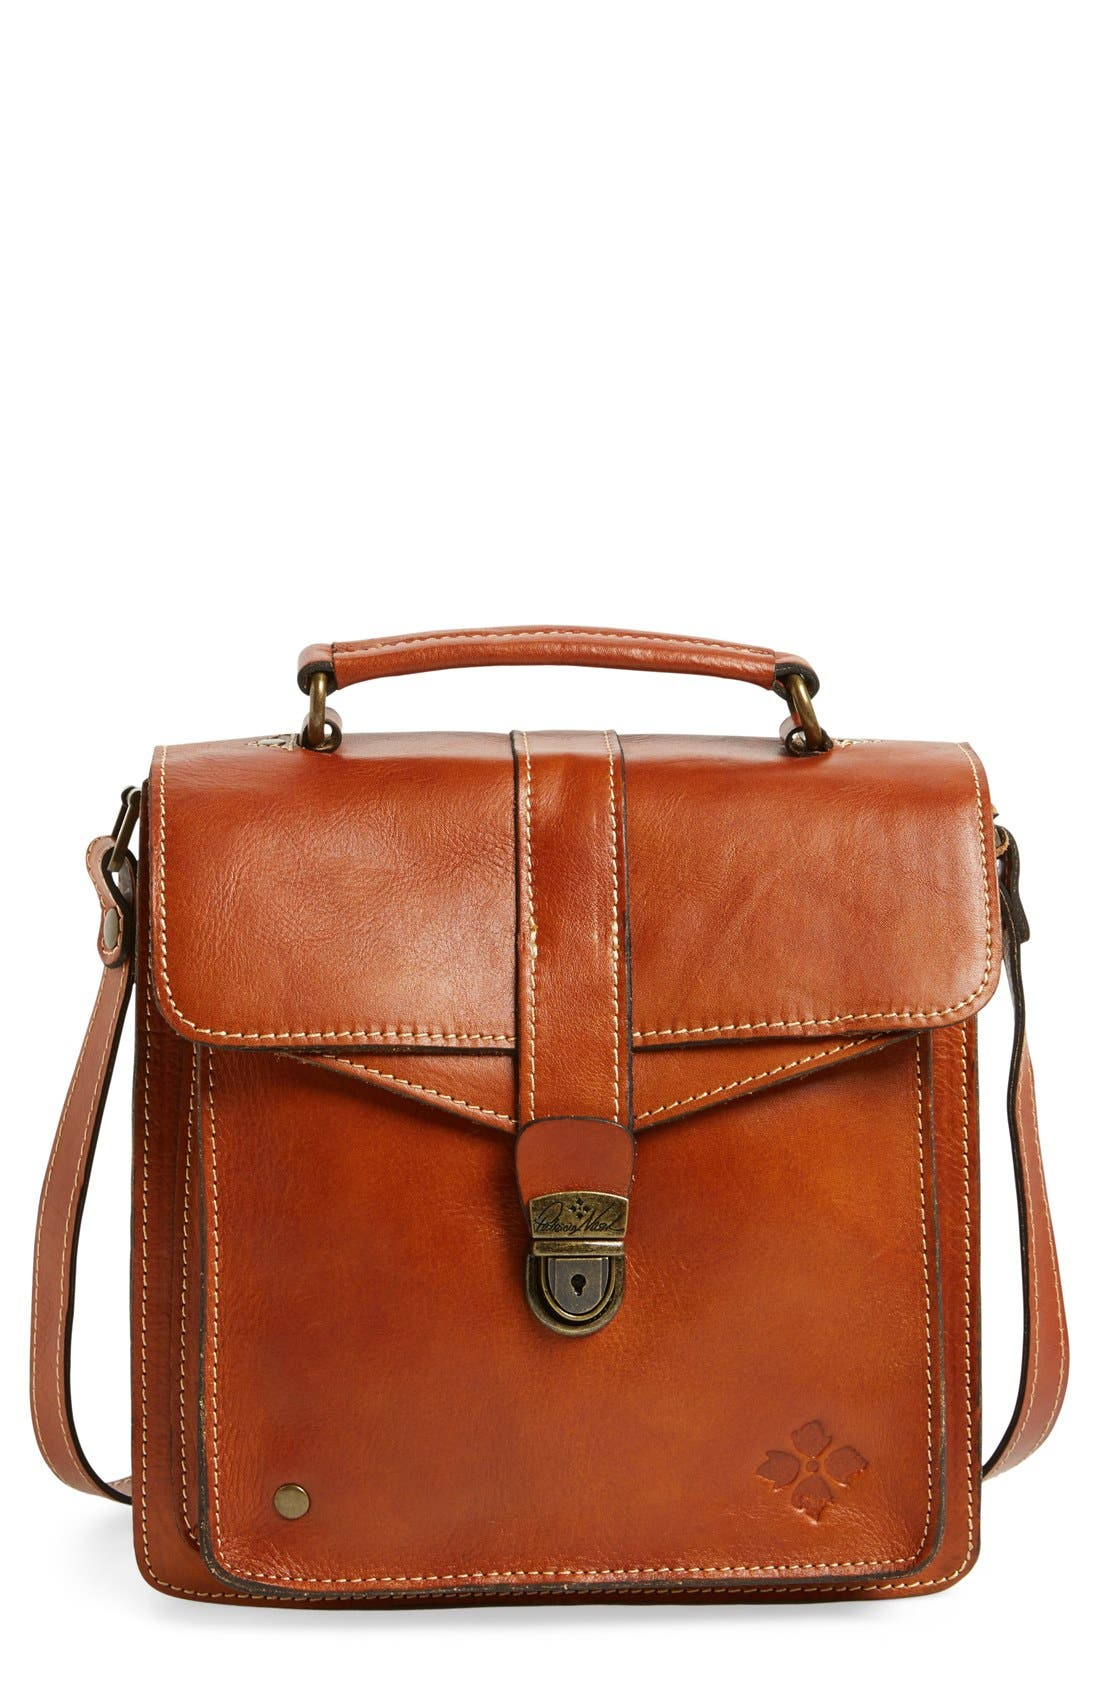 Alternate Image 1 Selected - Patricia Nash 'Toledo' Leather Crossbody Bag